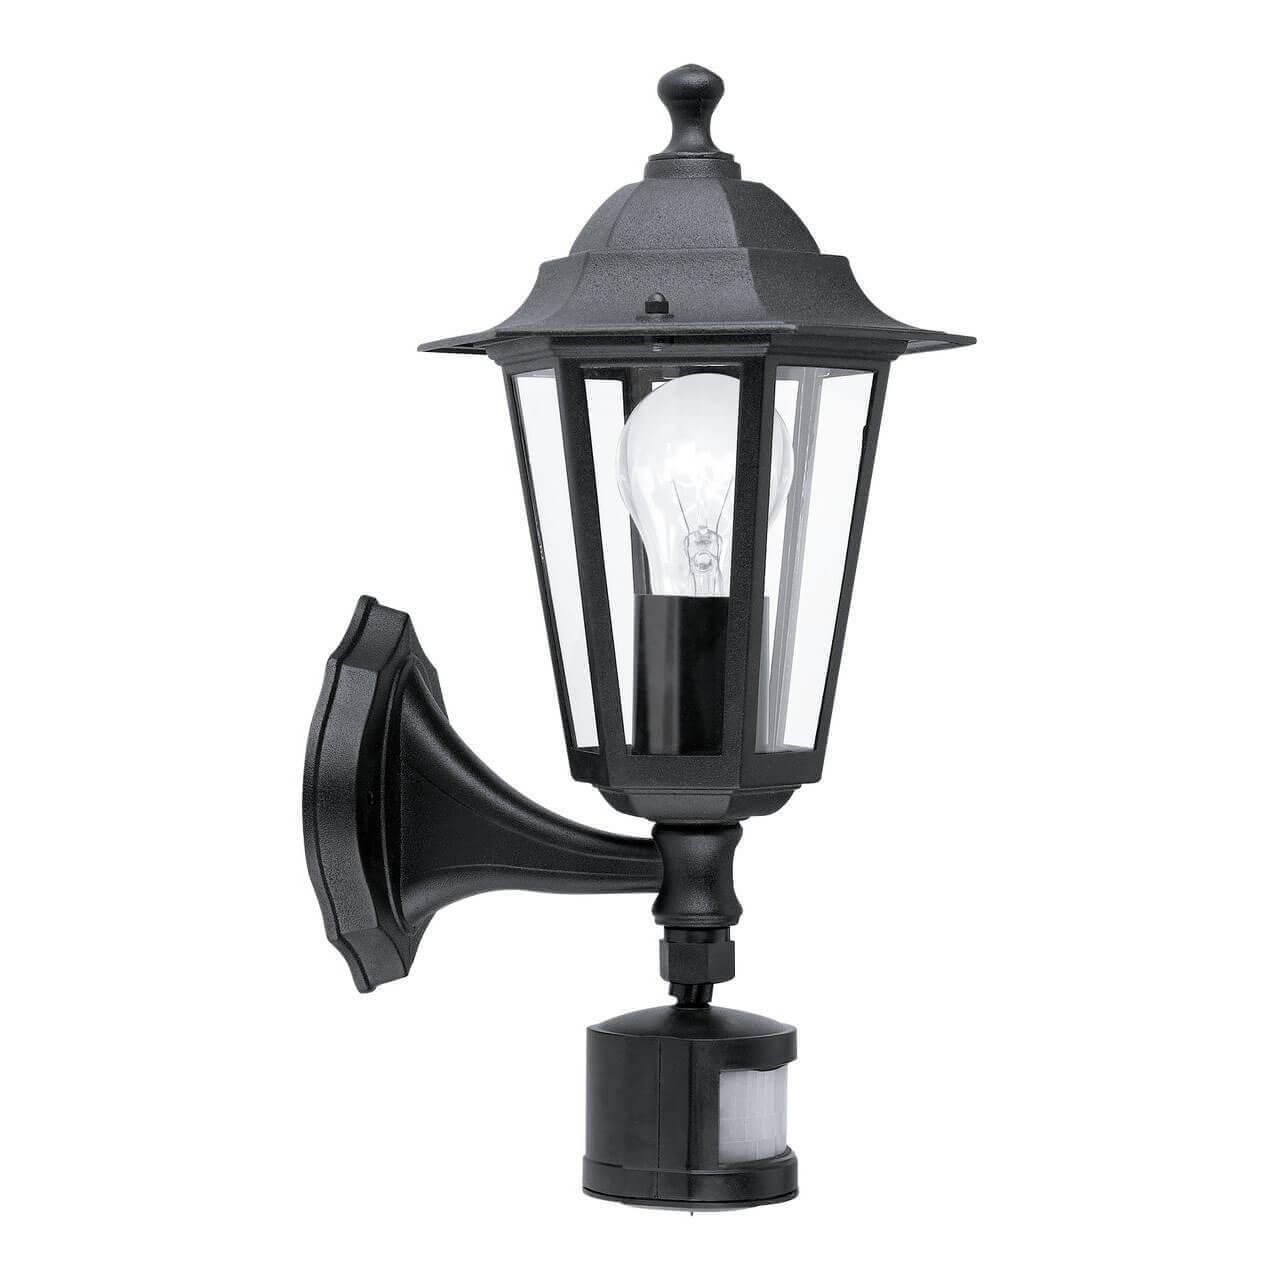 Светильник Eglo 22469 Laterna цена 2017